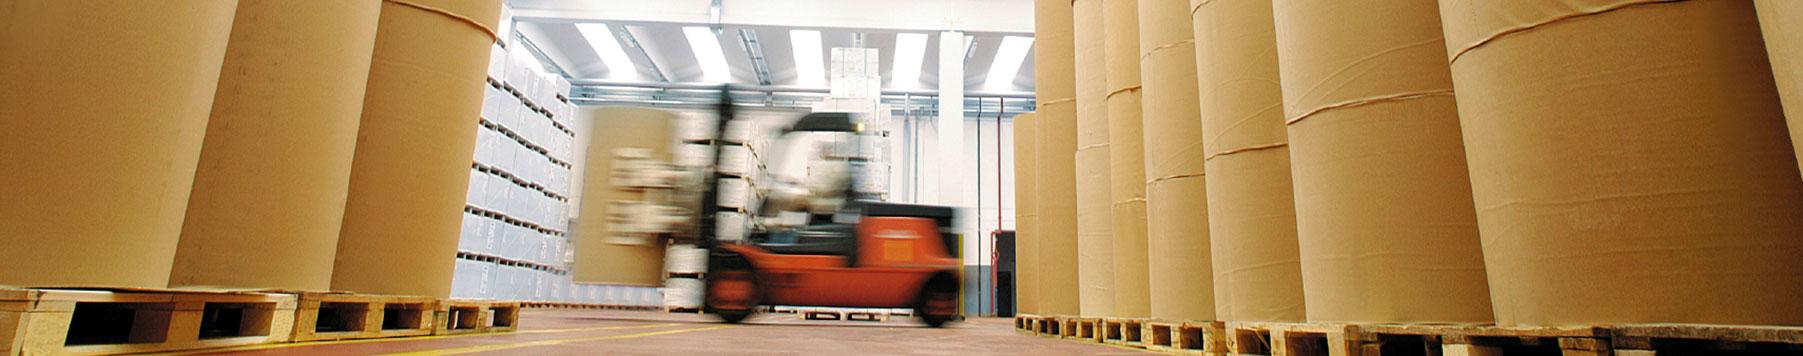 manufacturing-logistics